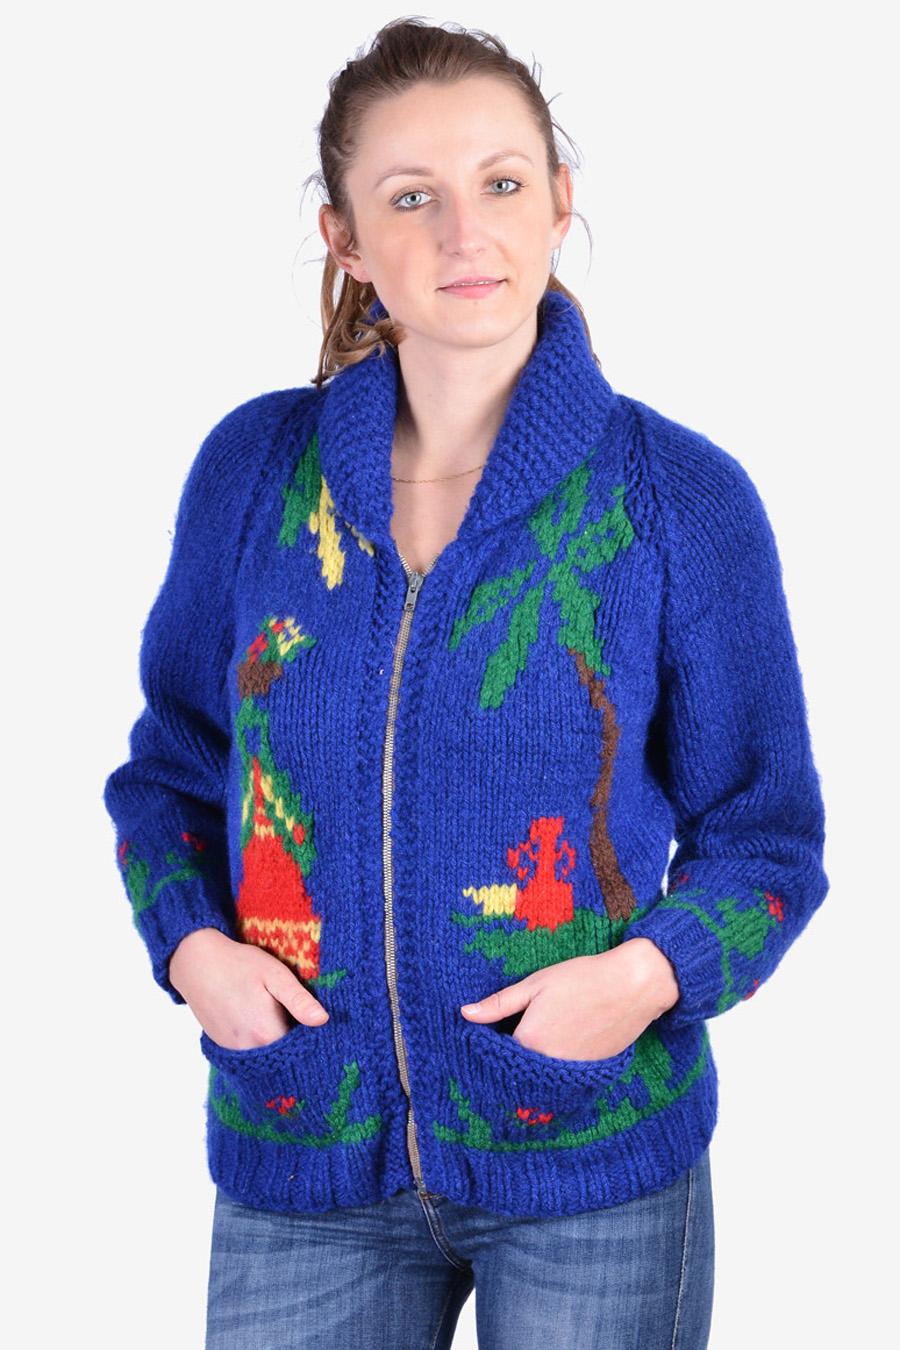 Women's Cowichan style cardigan